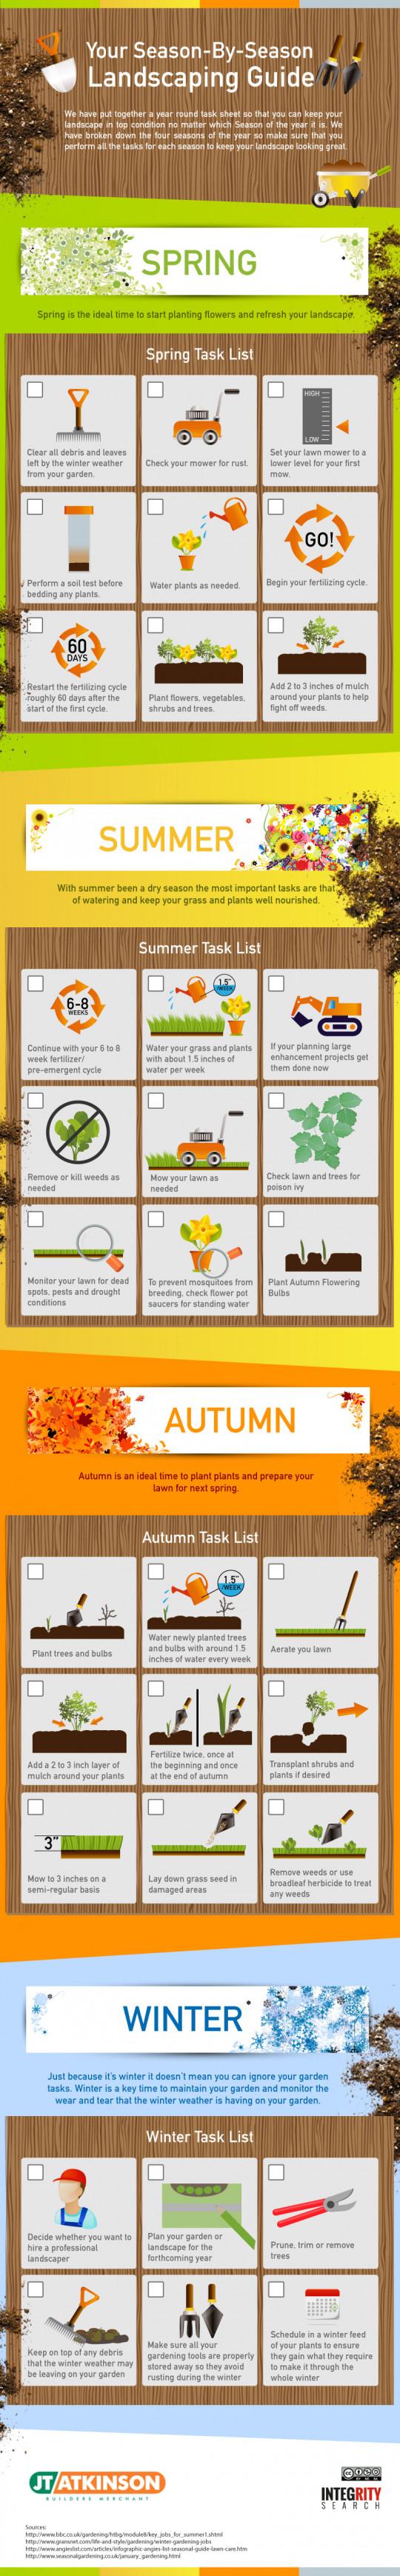 Season By Season Landscaping Guide [Infographic] | ecogreenlove